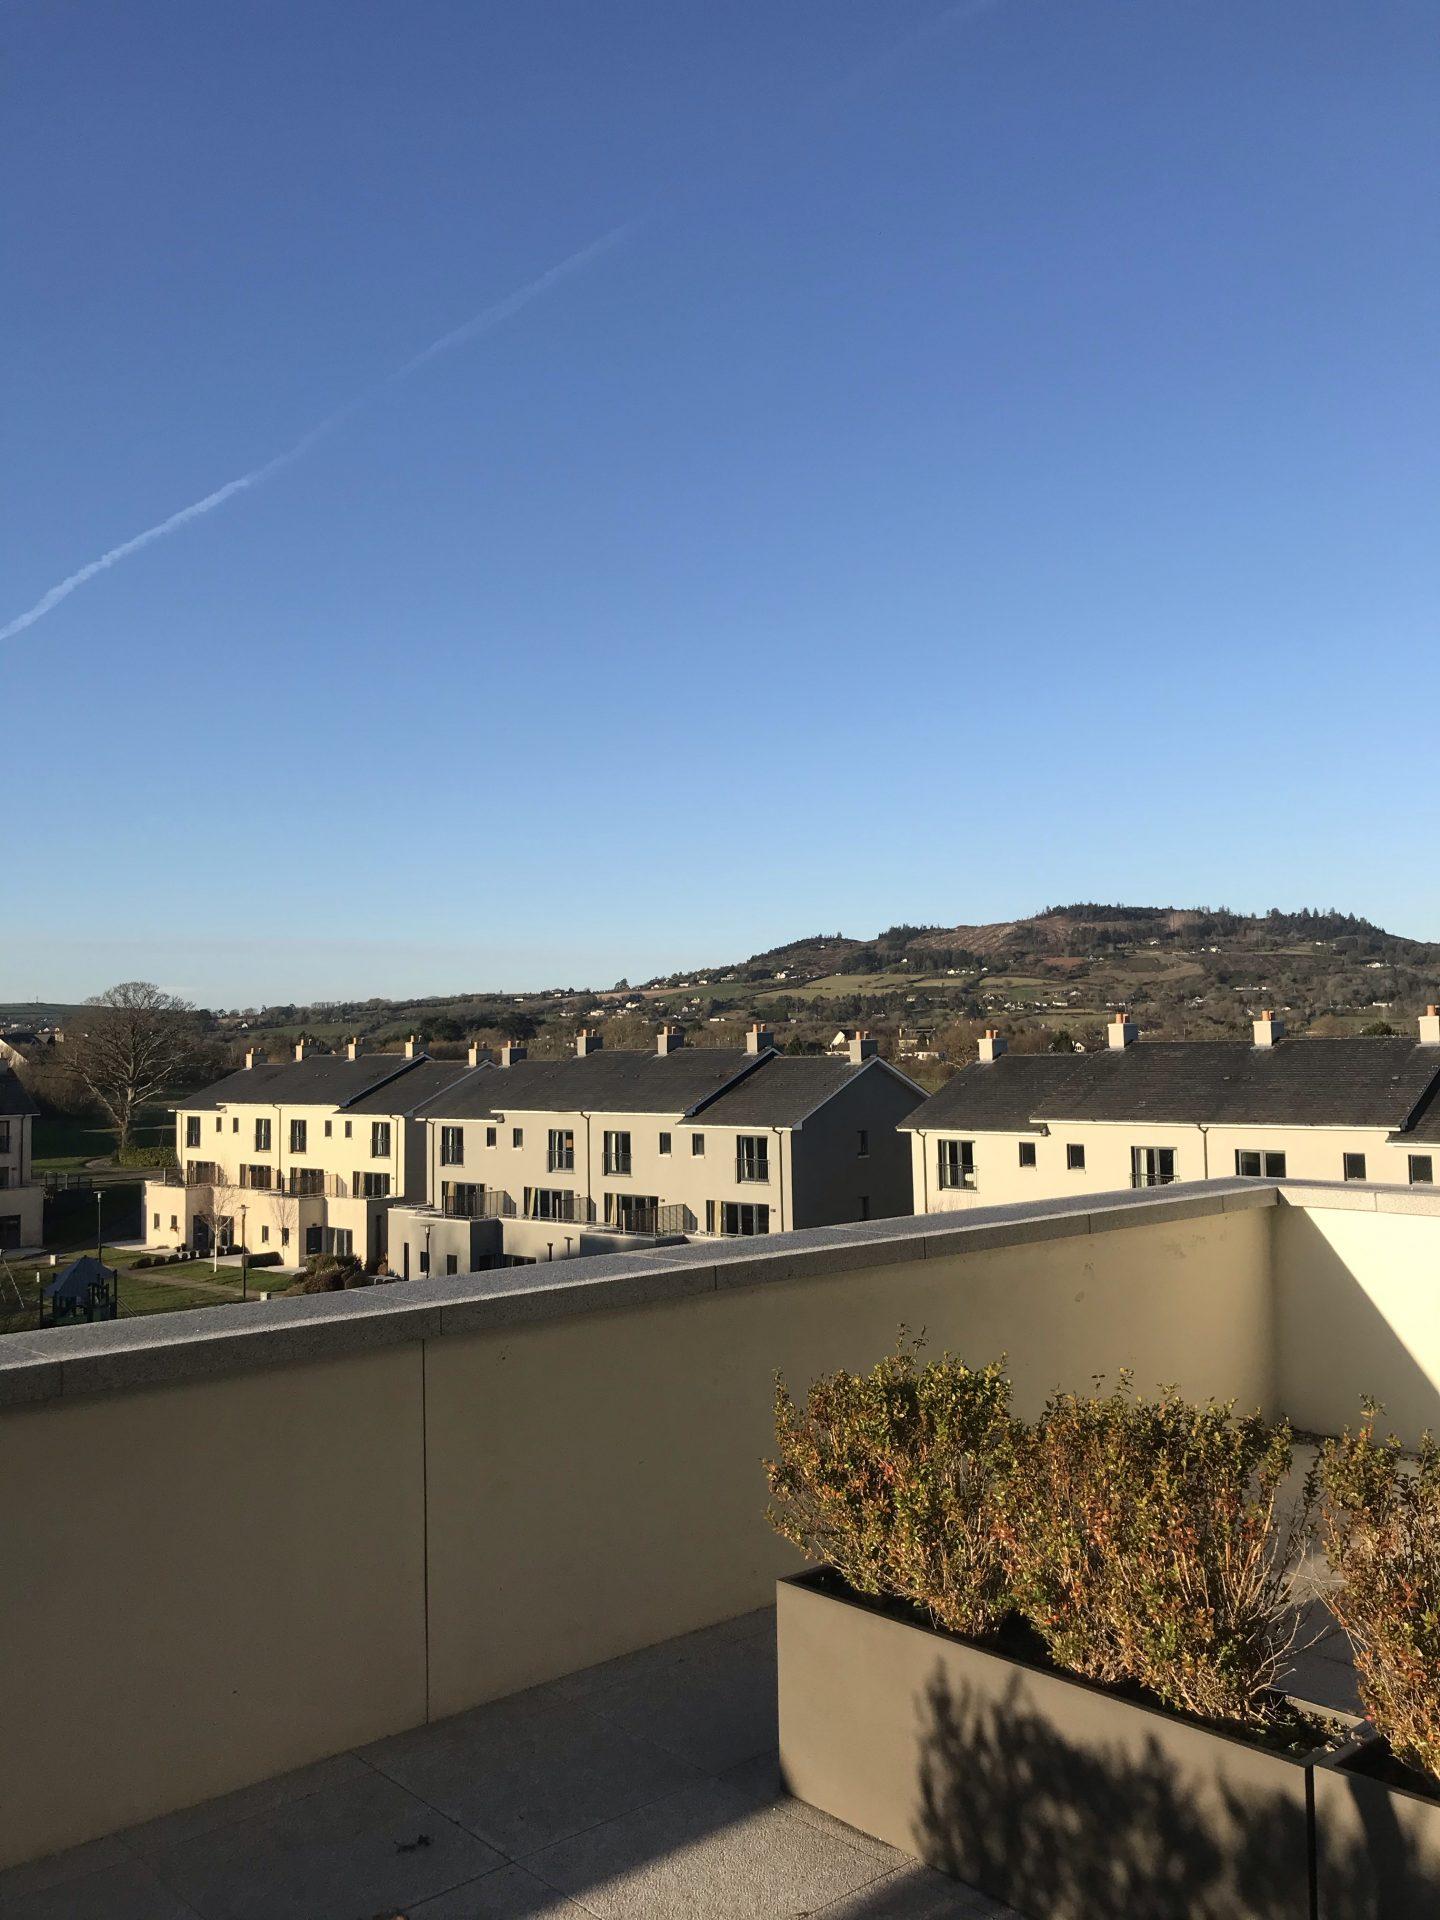 seafield hotel balcony view